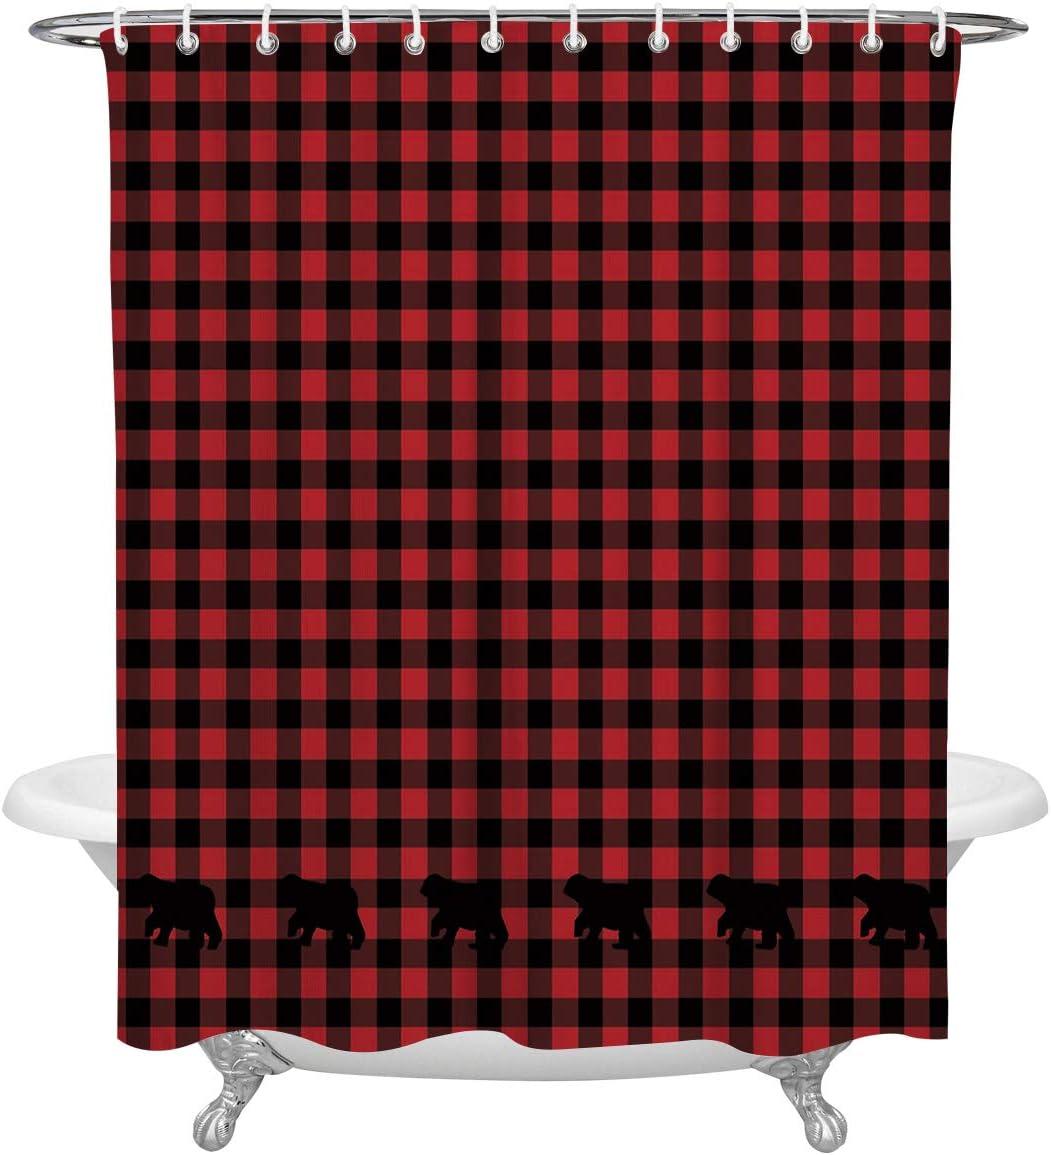 FAMILYDECOR Black Red Plaid Pattern Buffalo Check Bear Applique Shower Curtain Waterproof Fabric Bathroom Decor Set with Hooks, 66